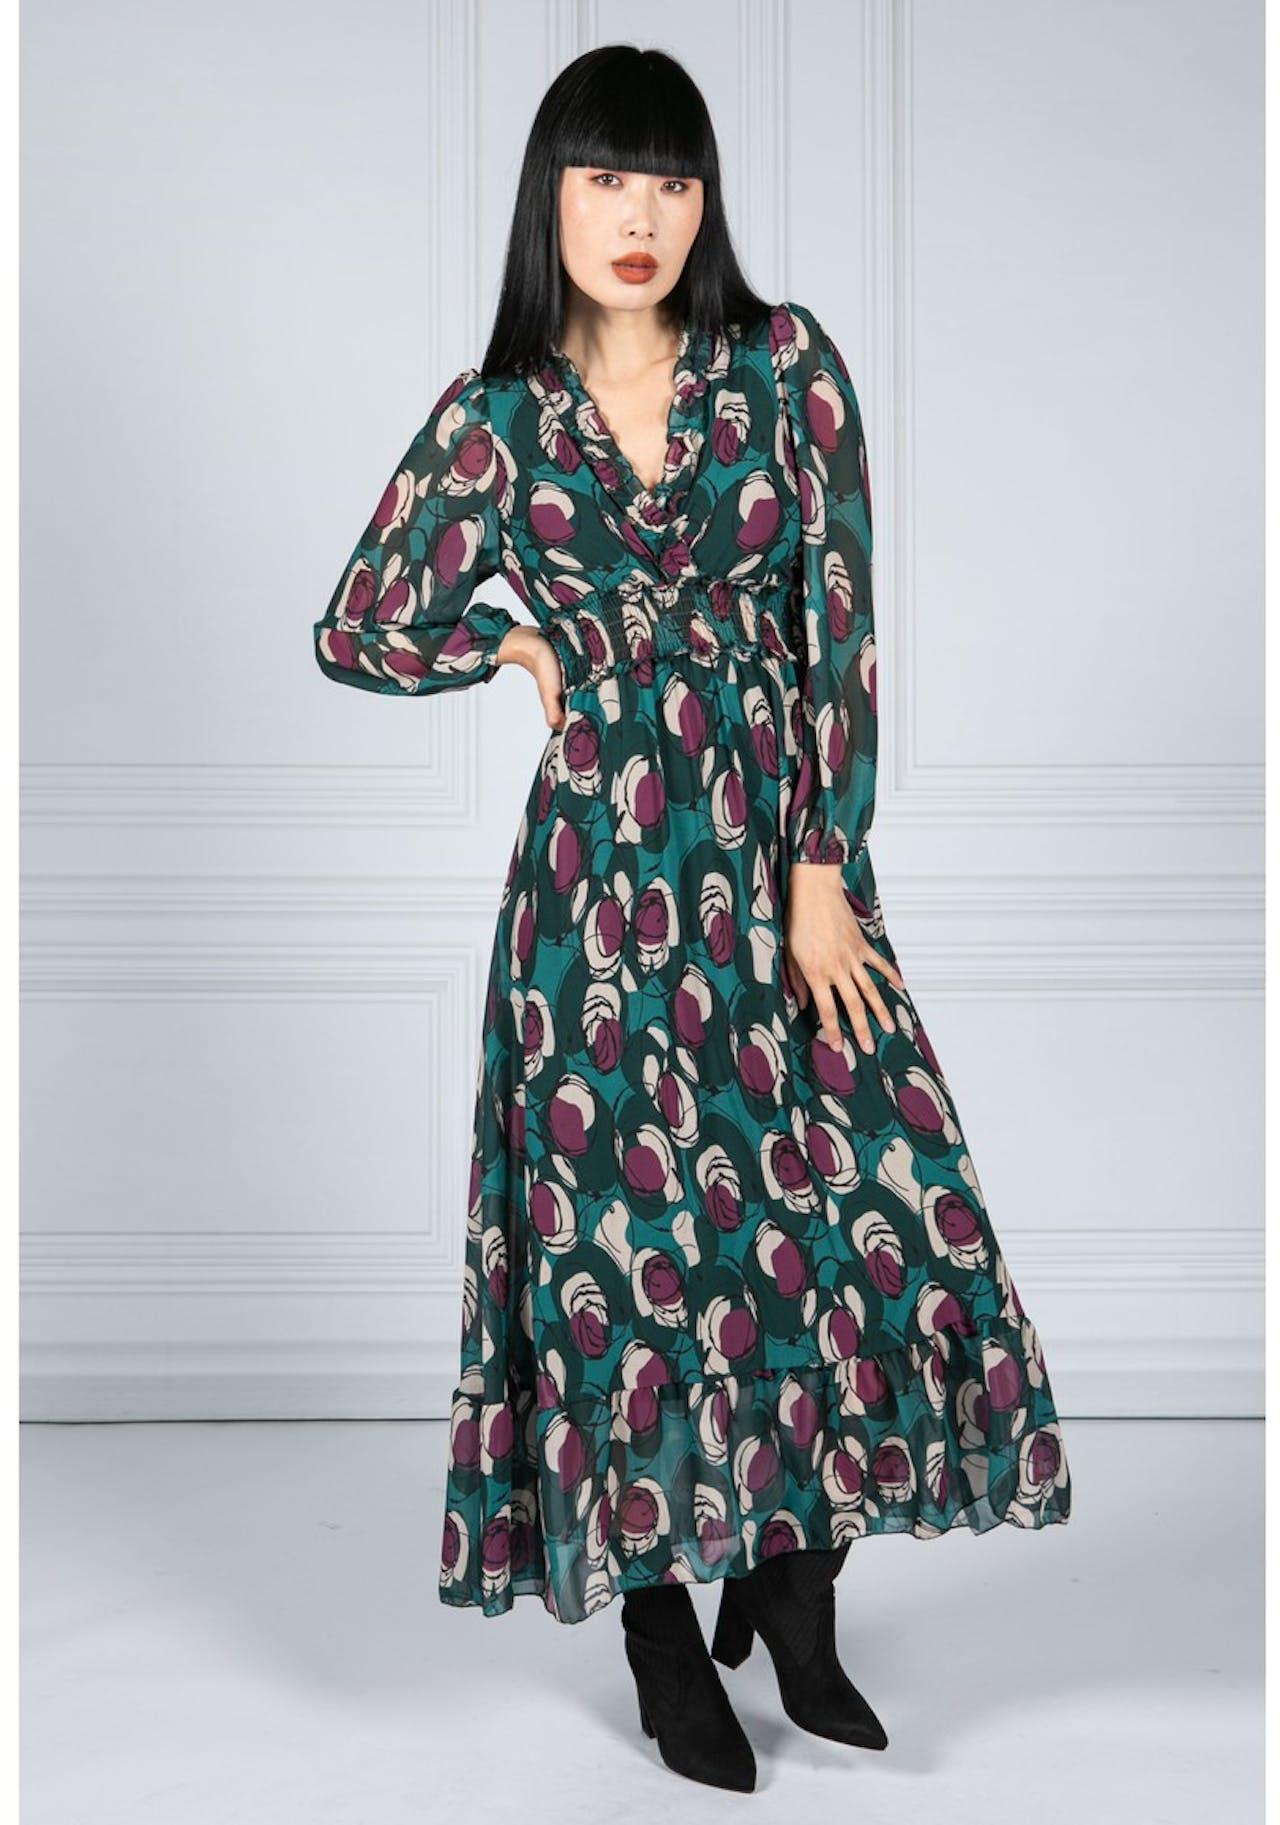 Emporium Ruffled Abstract Print Dress in Bottle Green